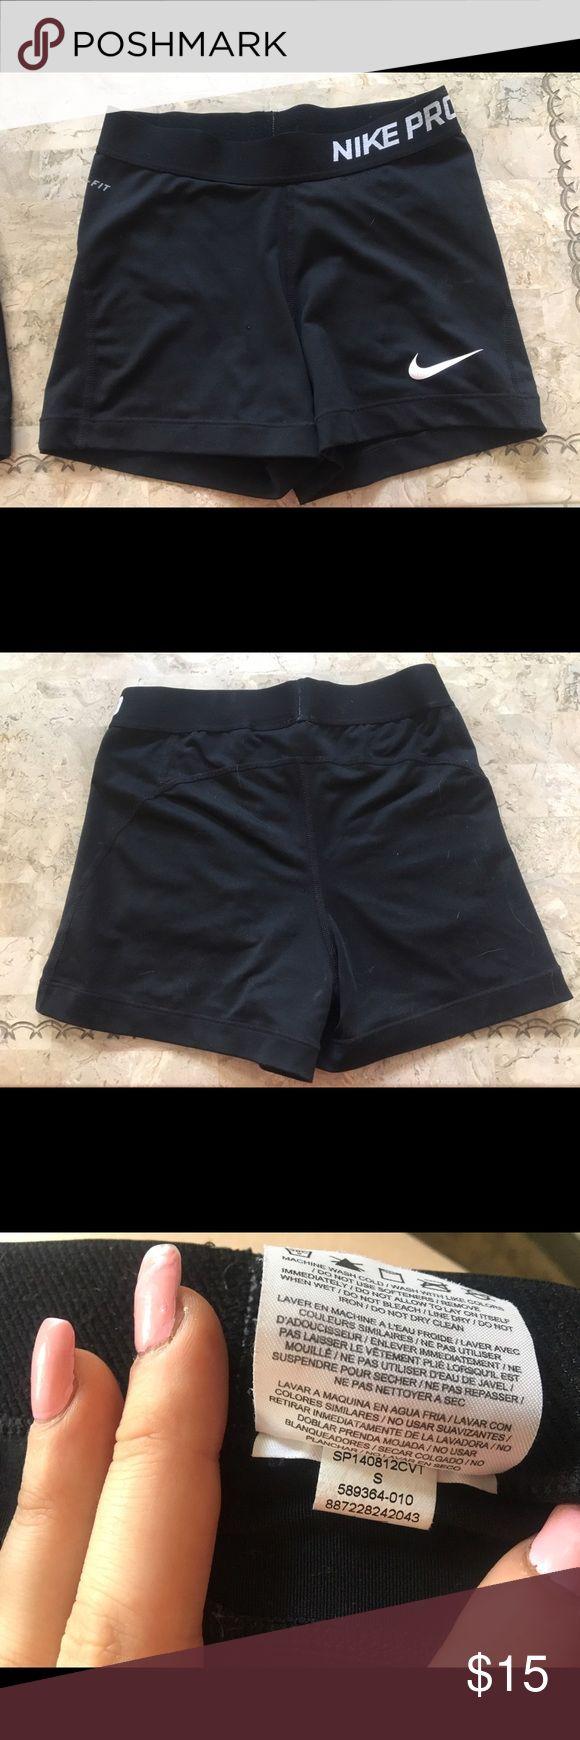 NIKE PRO SPANDEX Never worn size small Nike pro spandex! Nike Shorts